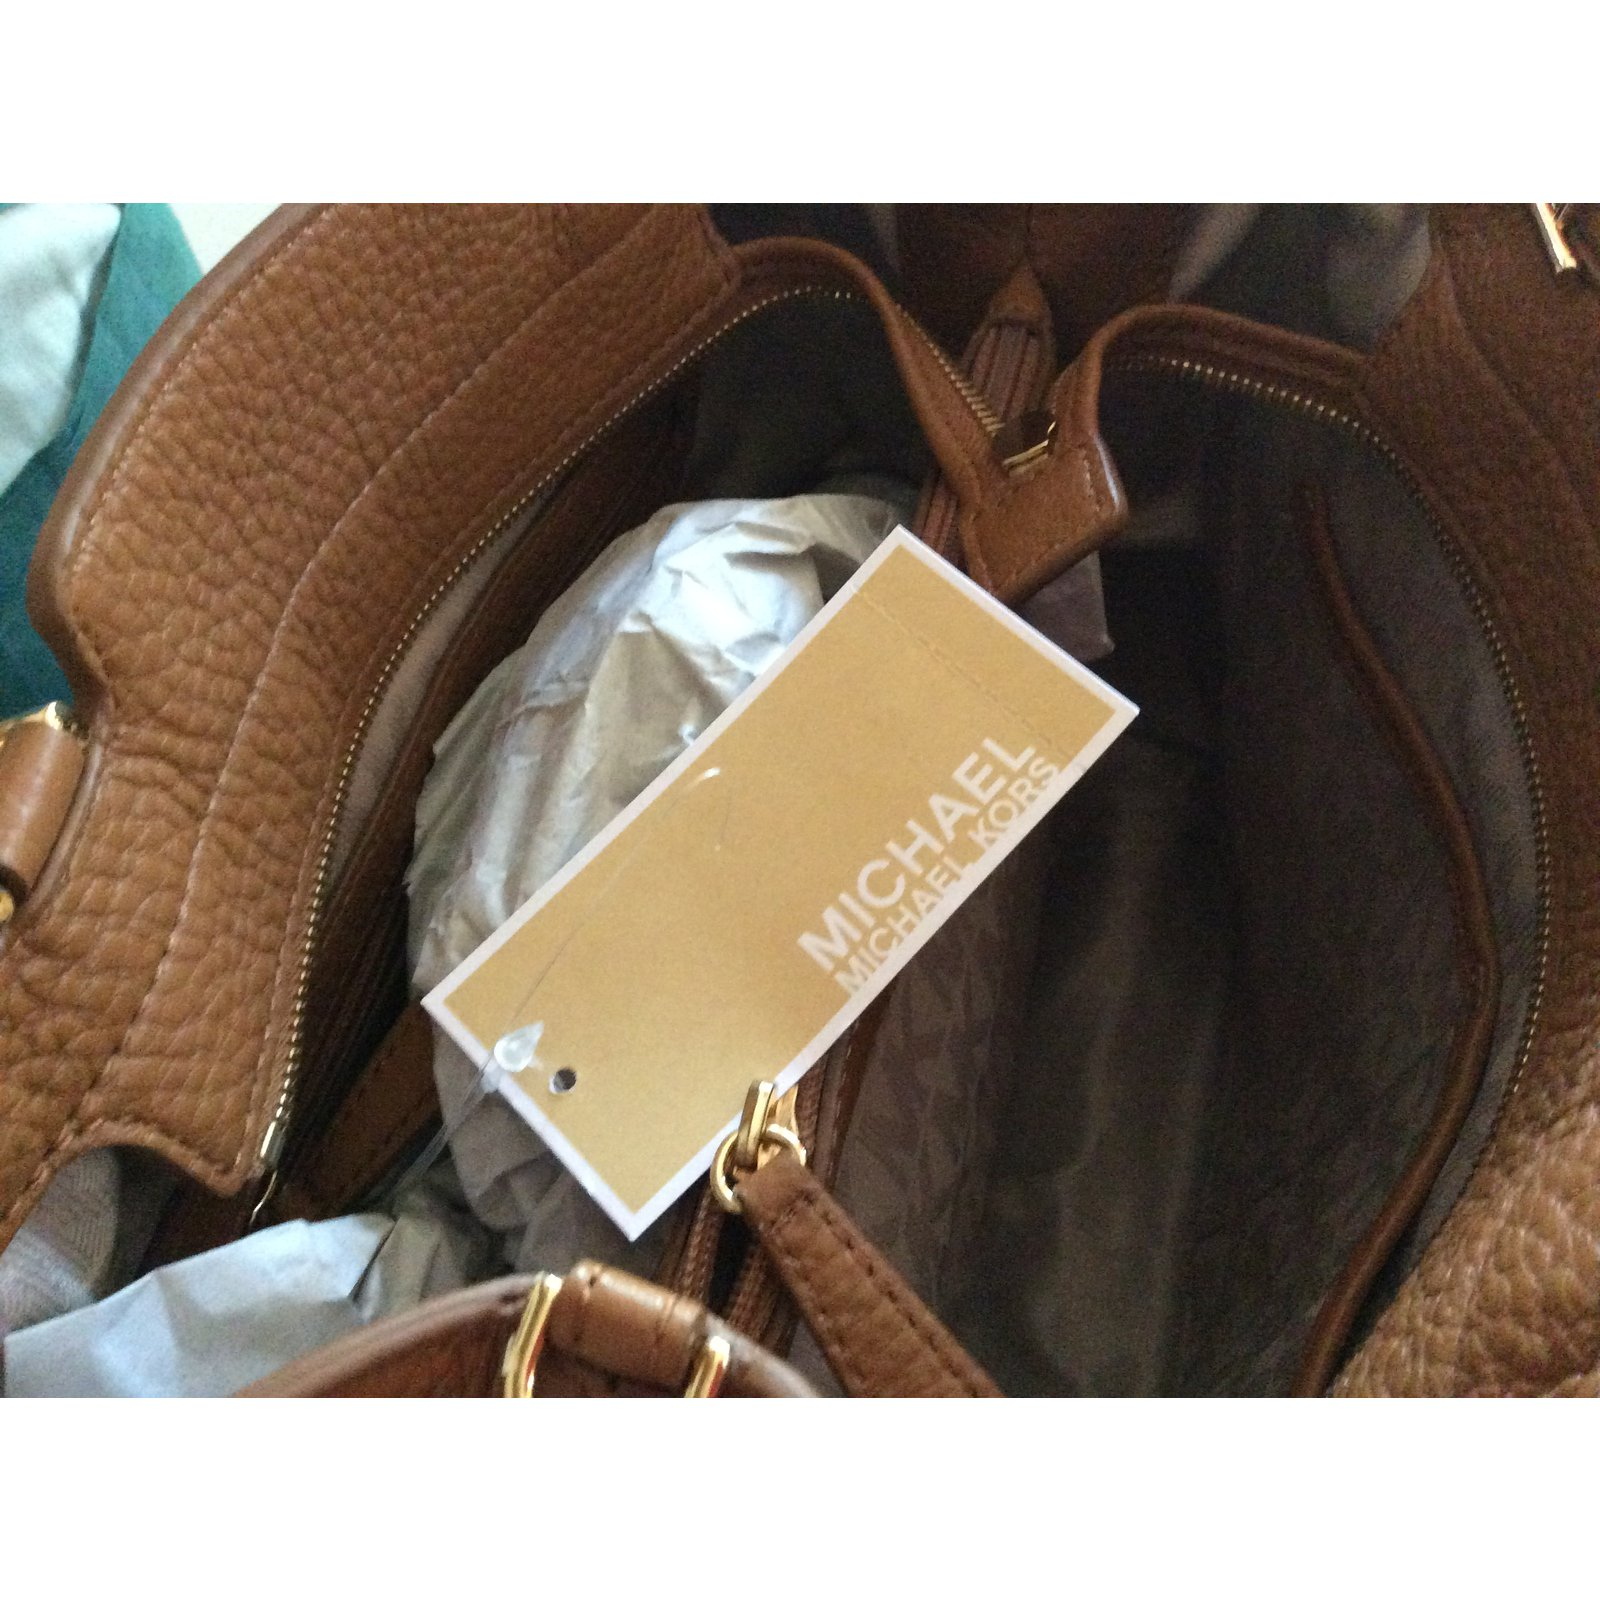 2d55c84ff016 Michael Kors Handbag Handbags Leather Caramel ref.24968 - Joli Closet